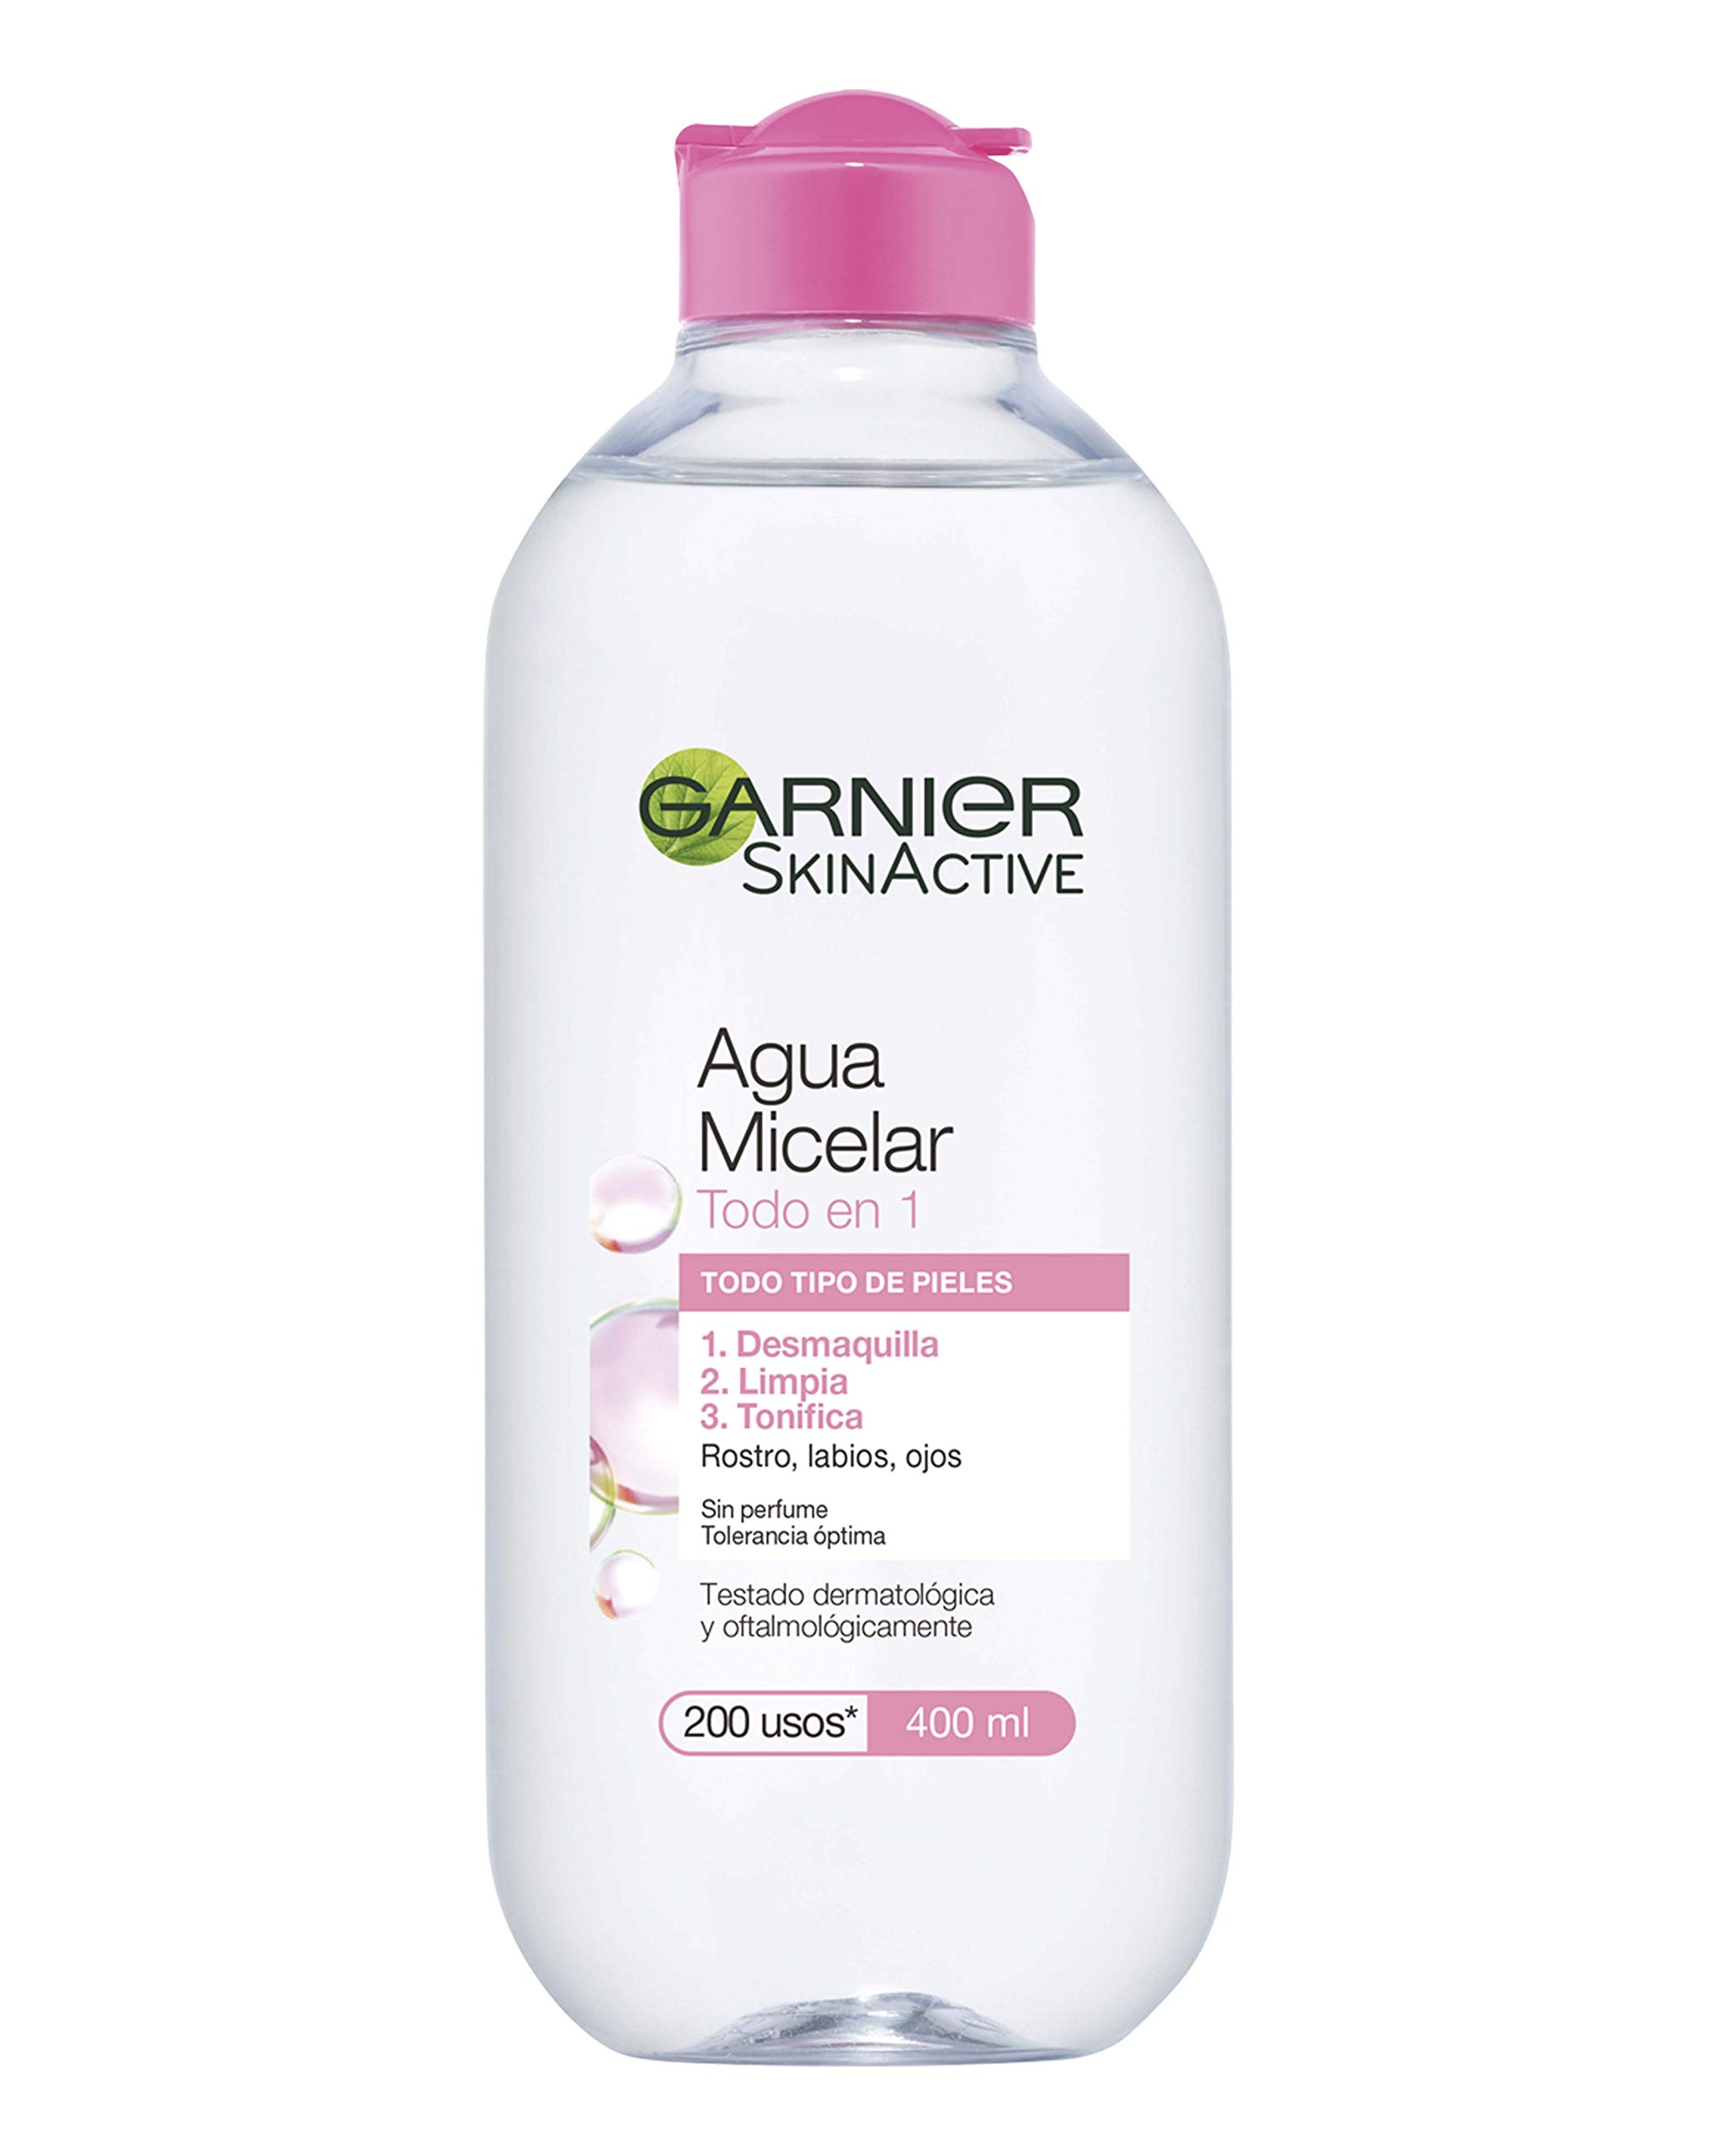 Garnier Skin Active Agua Micelar Clásica para Pieles Normales Todo en Uno - 400 ml product